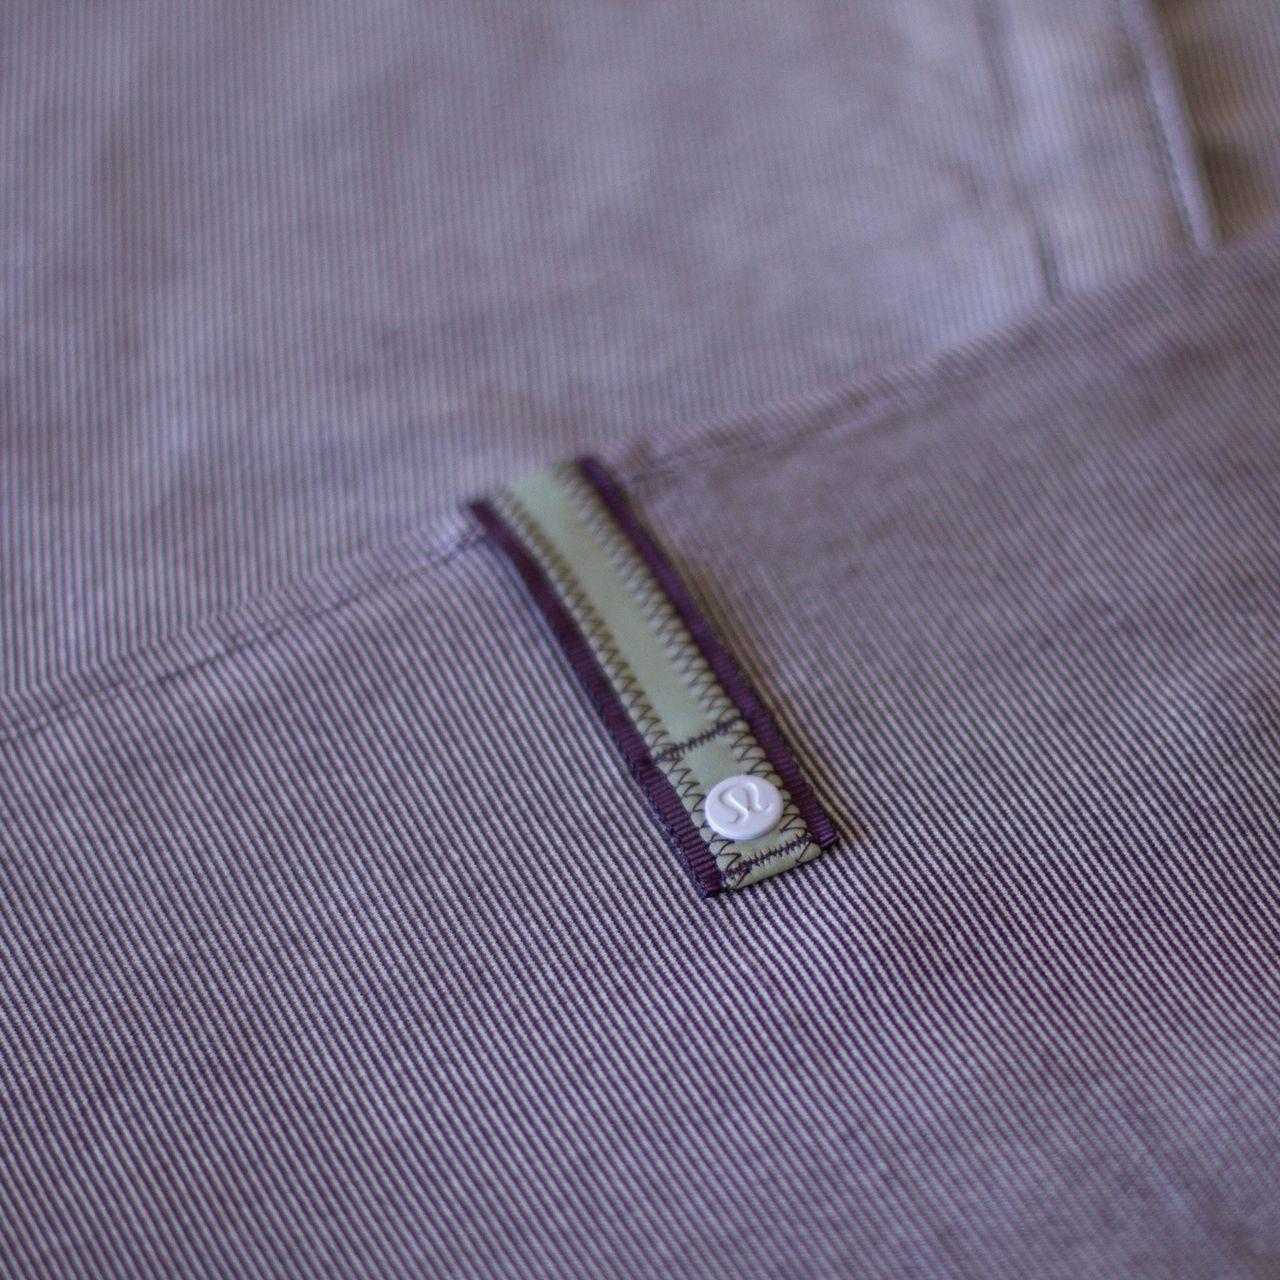 Lululemon Vinyasa Scarf - Wee Stripe Lilac Deep Zinfandel / Deep Zinfandel